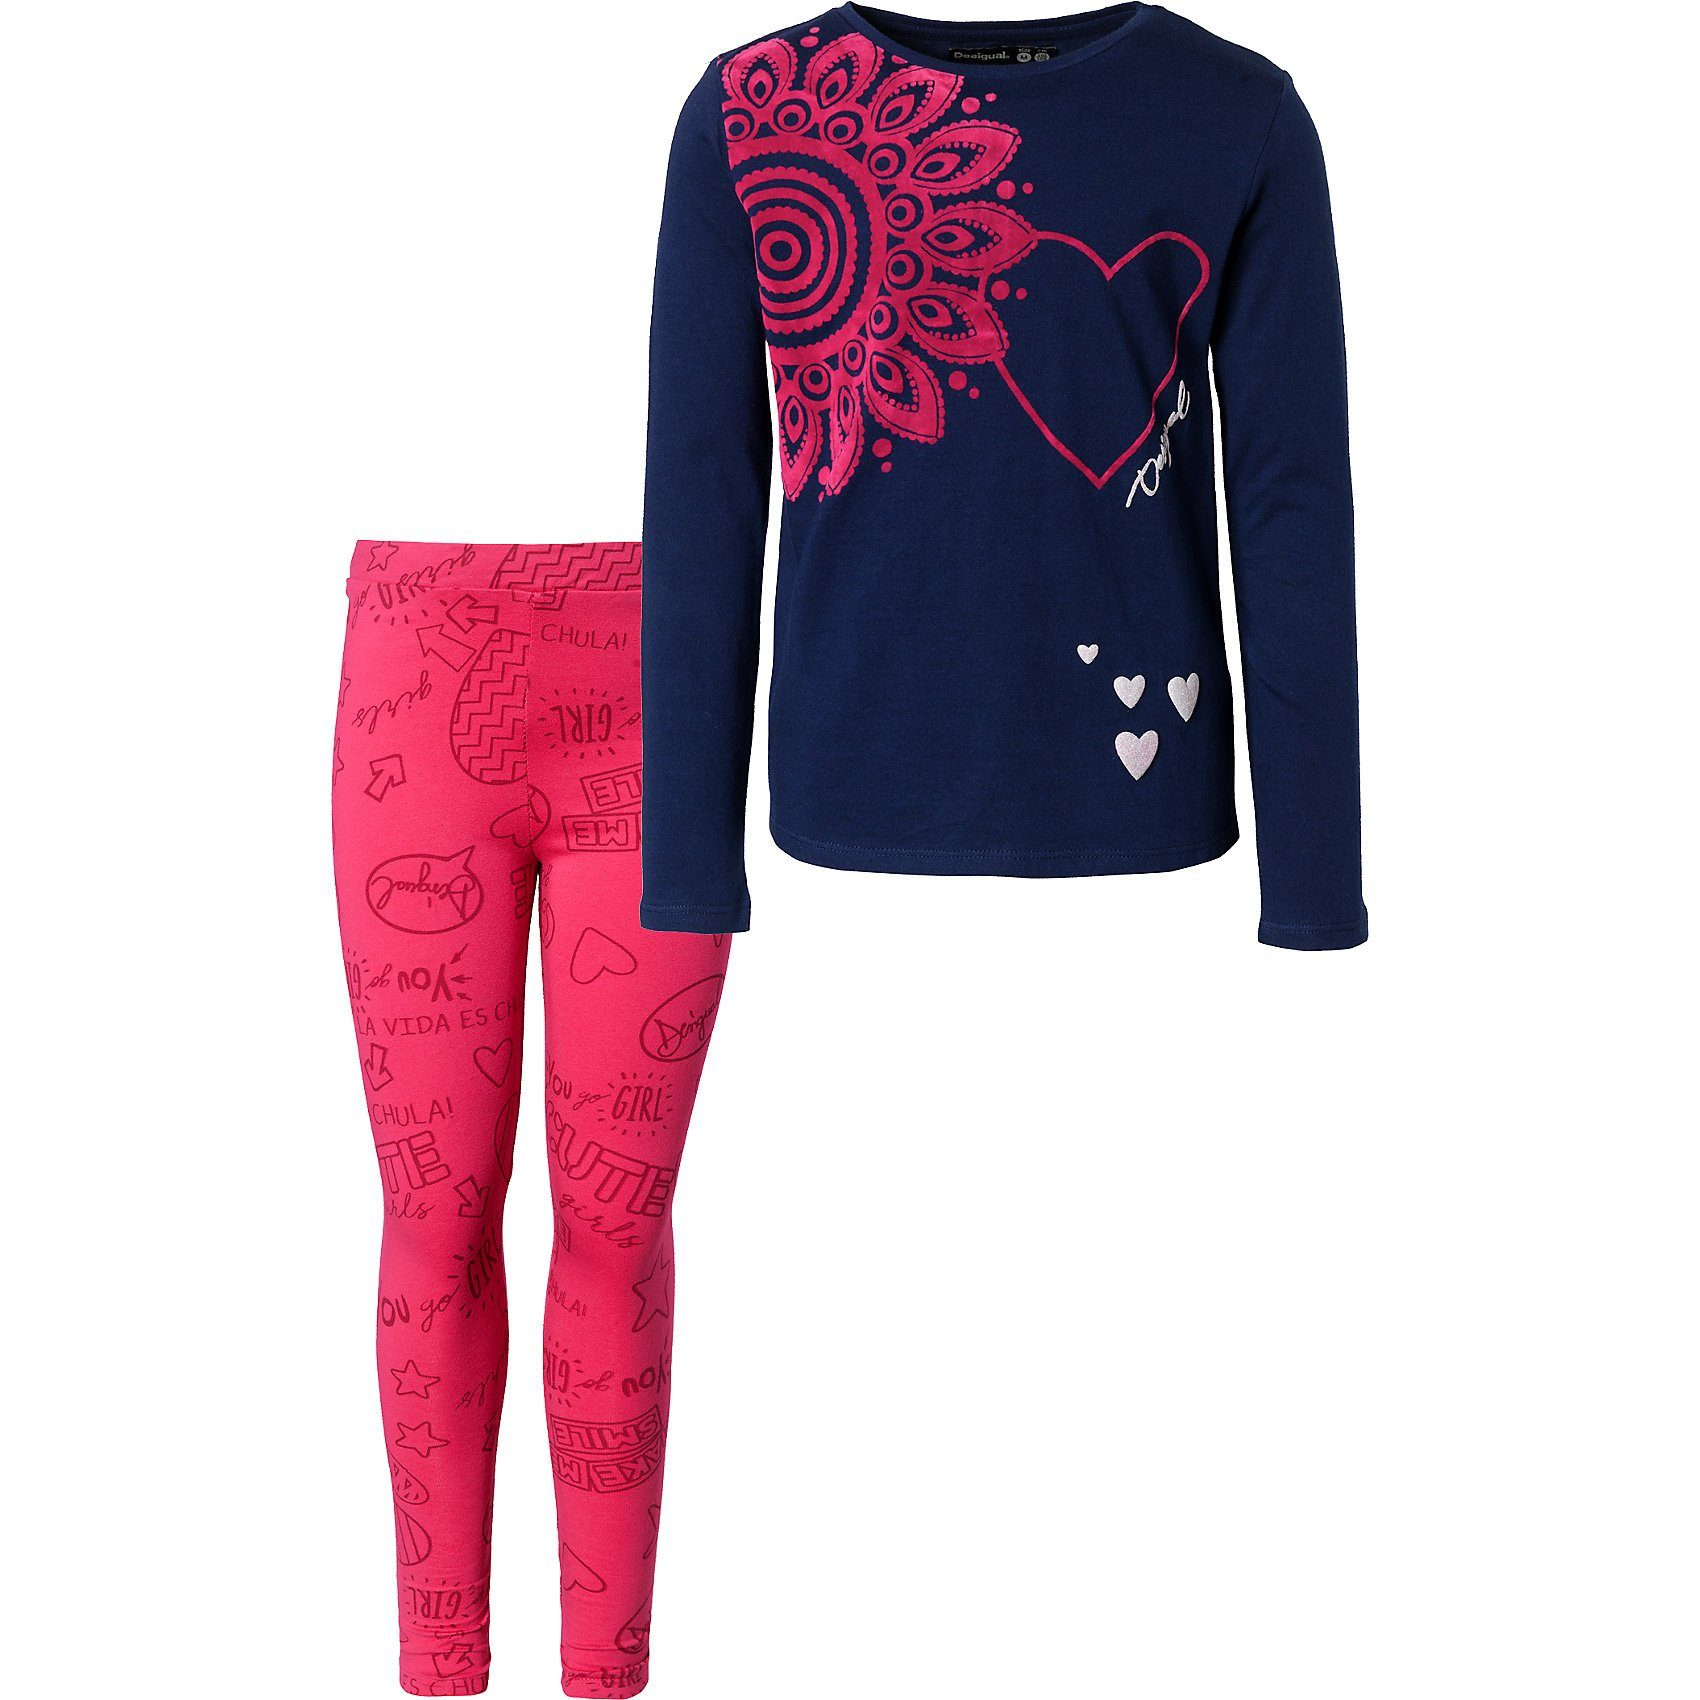 Damen,  Mädchen,  Kinder Desigual Set Langarmshirt + Leggings für Mädchen blau | 08434486839663